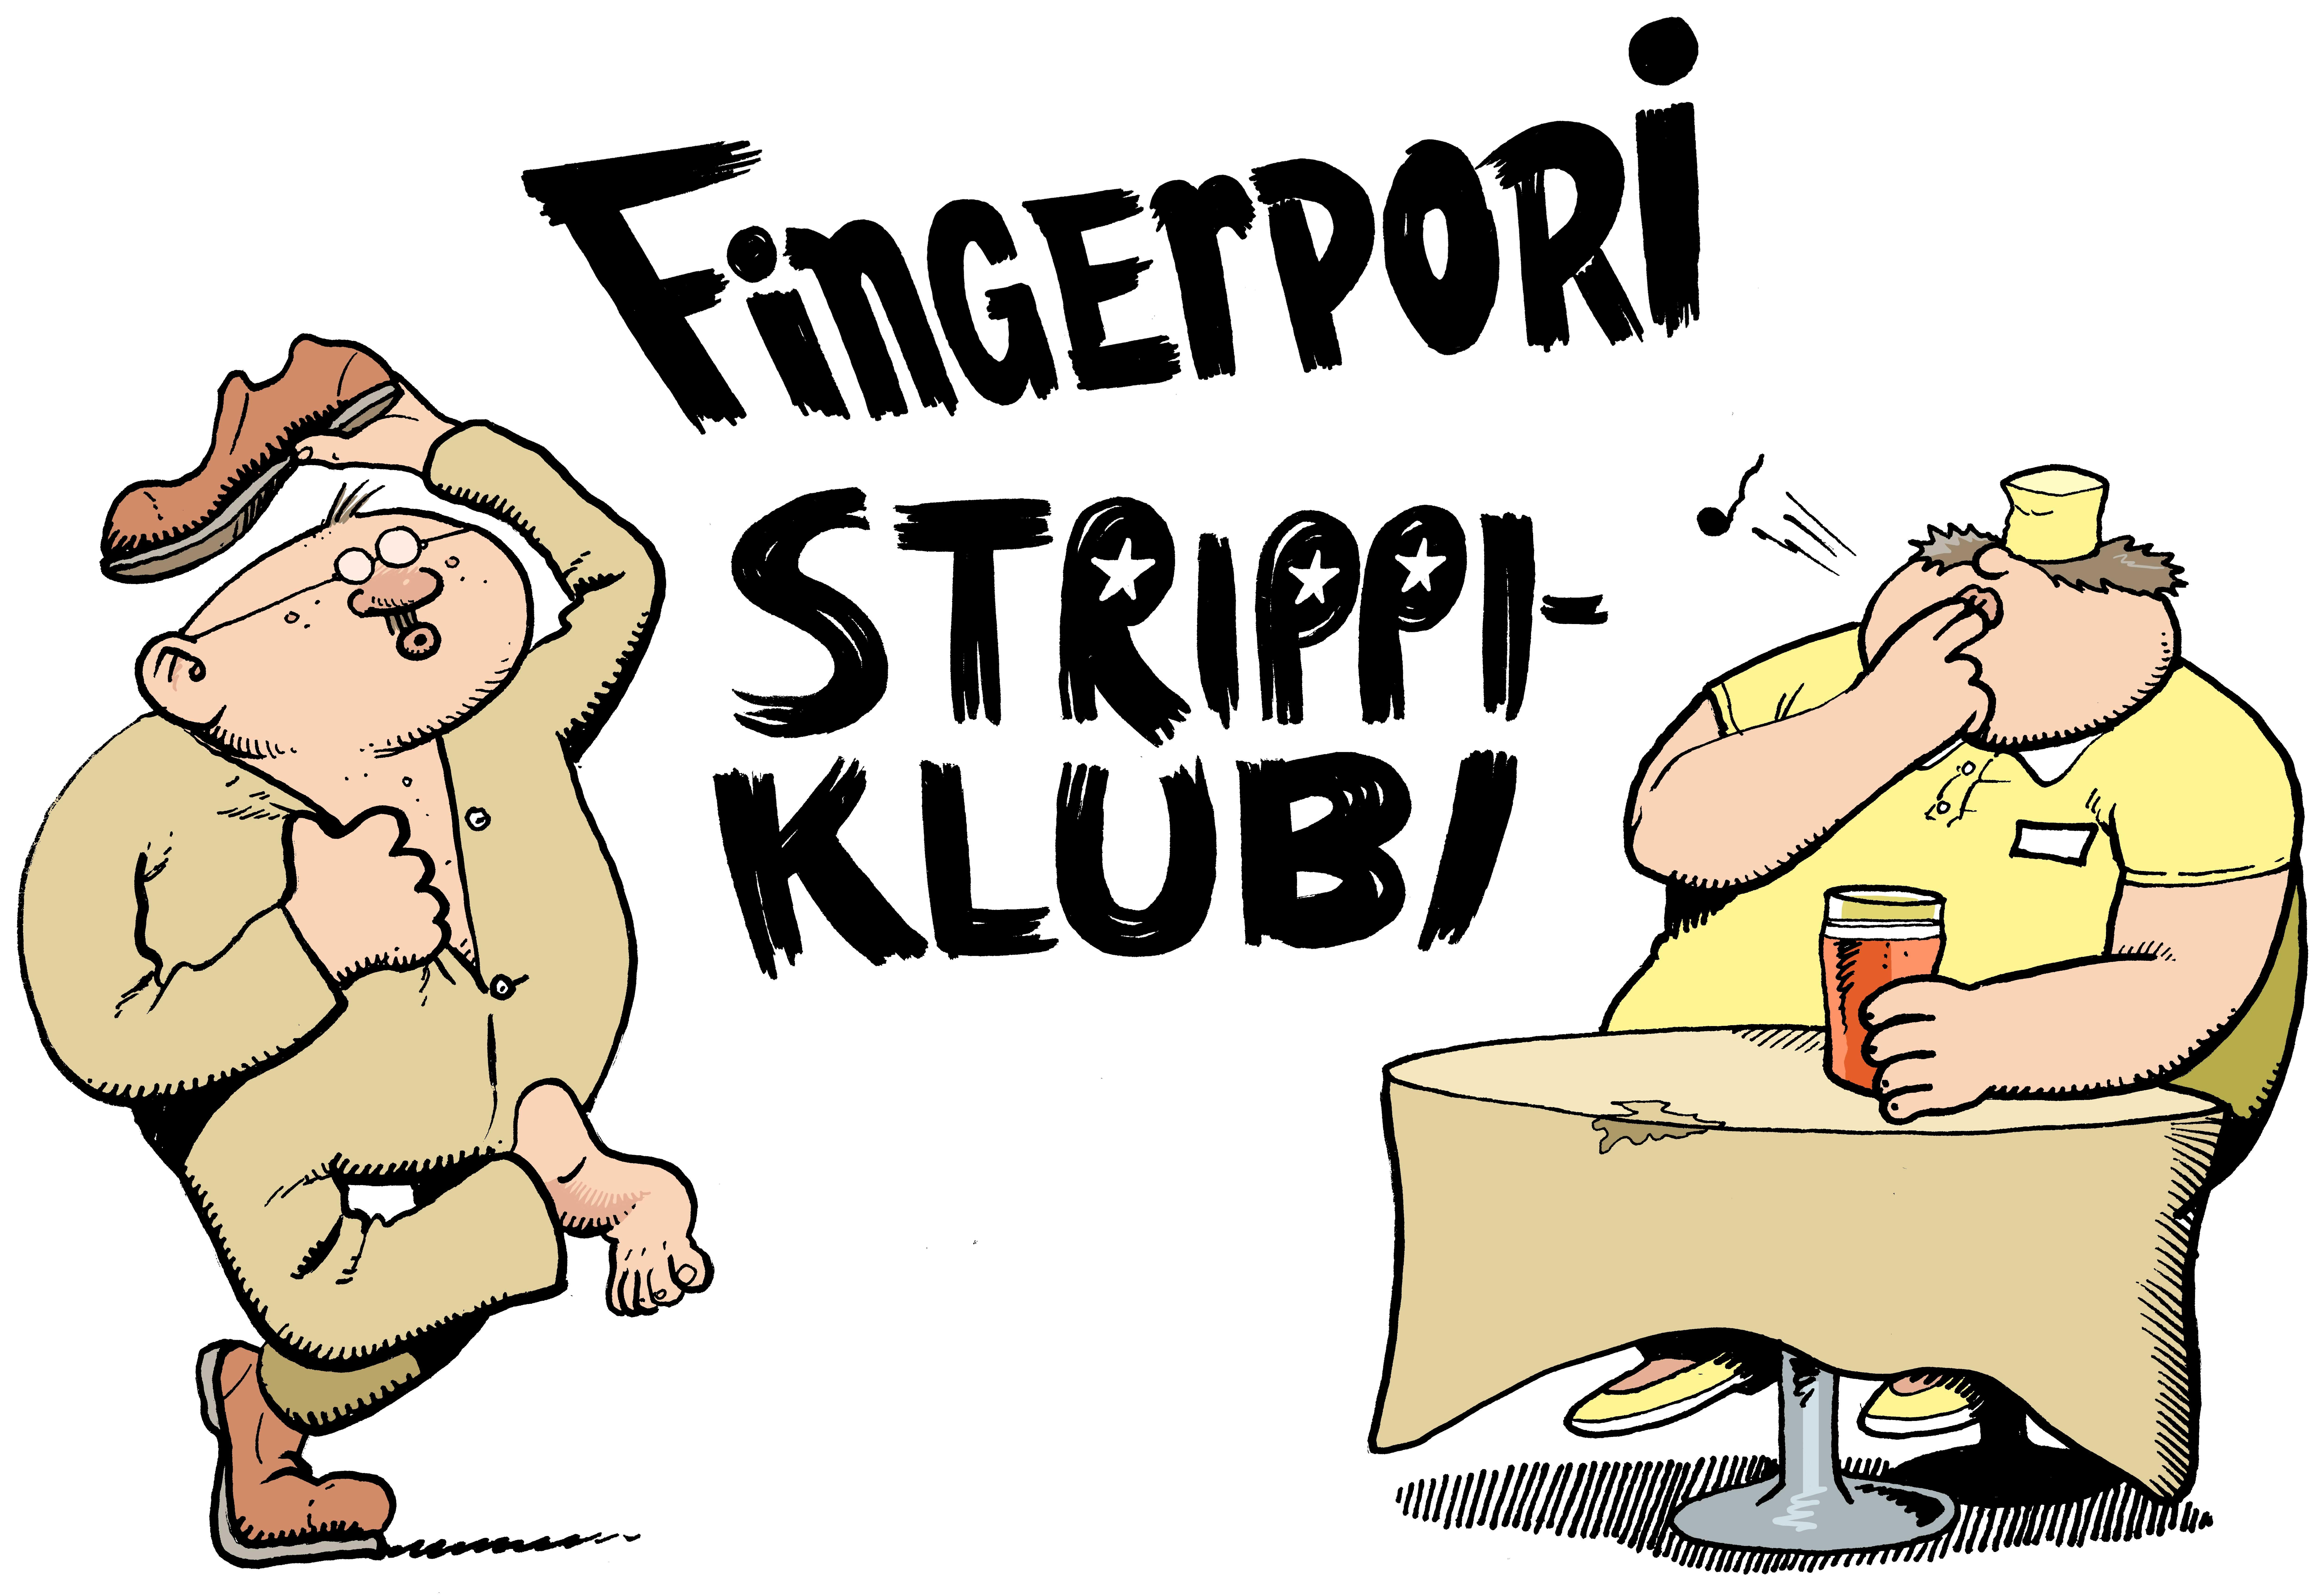 Helsinki Strippiklubi